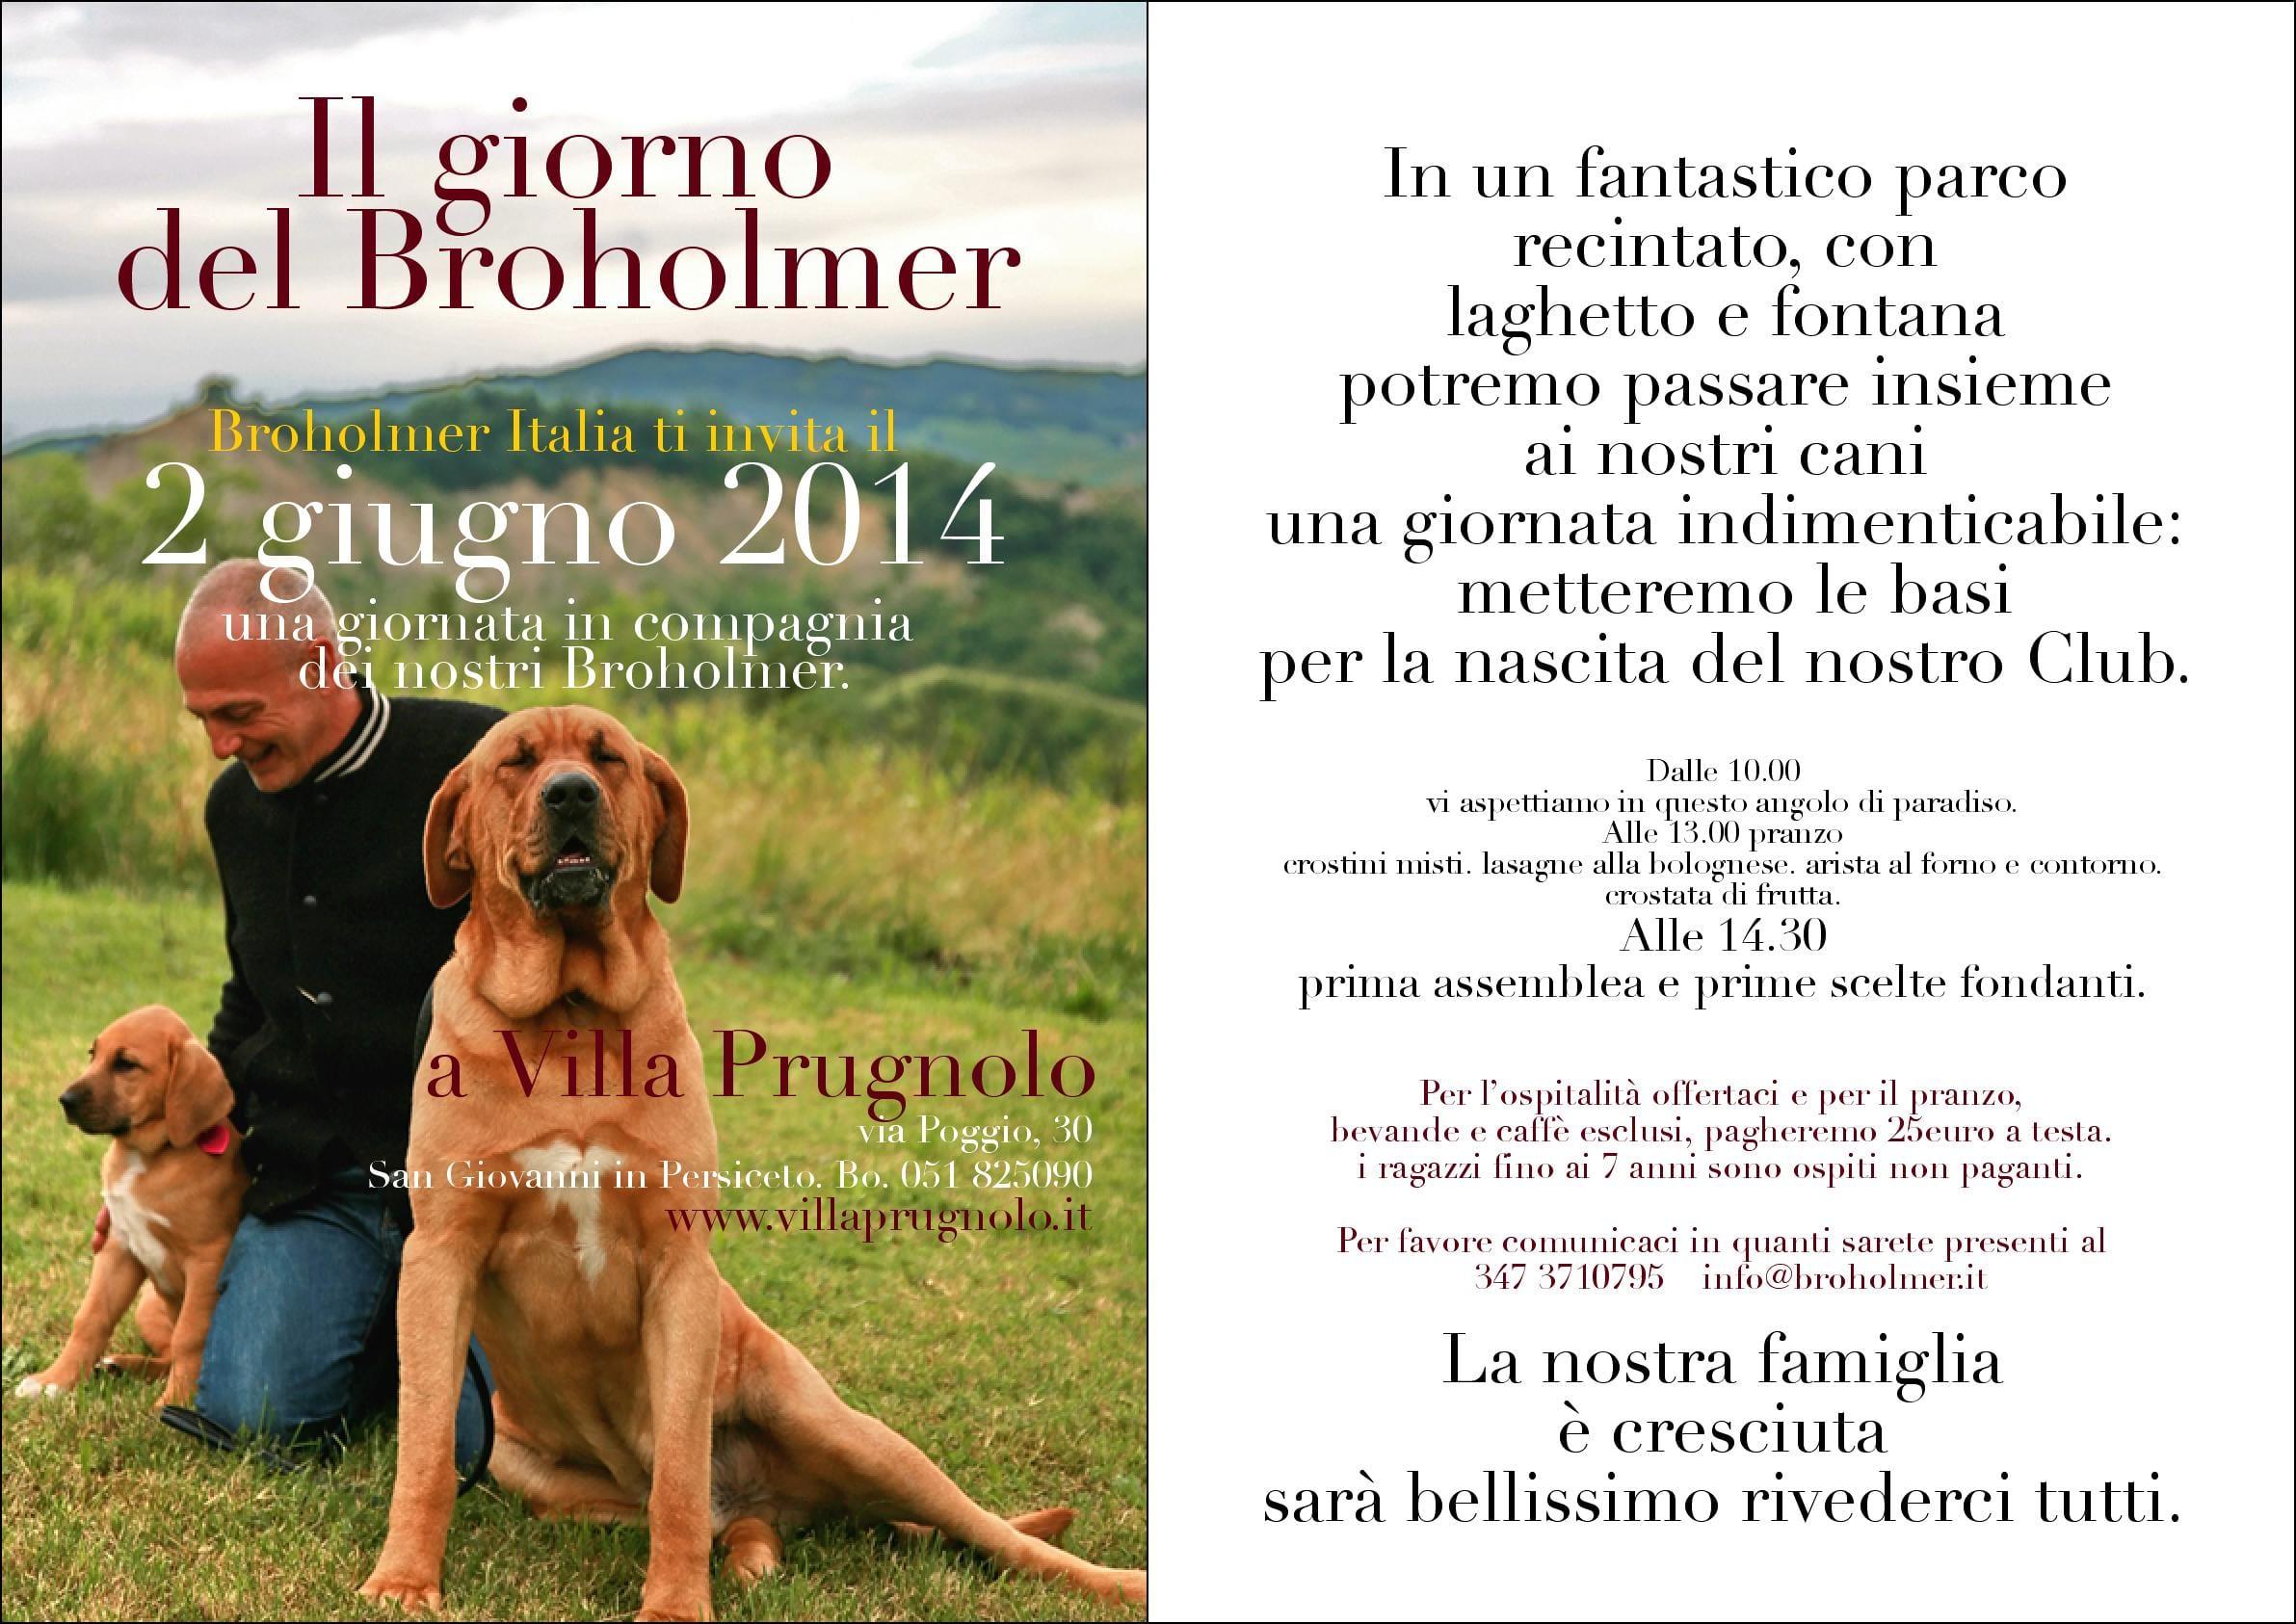 broholmer-1  (2)